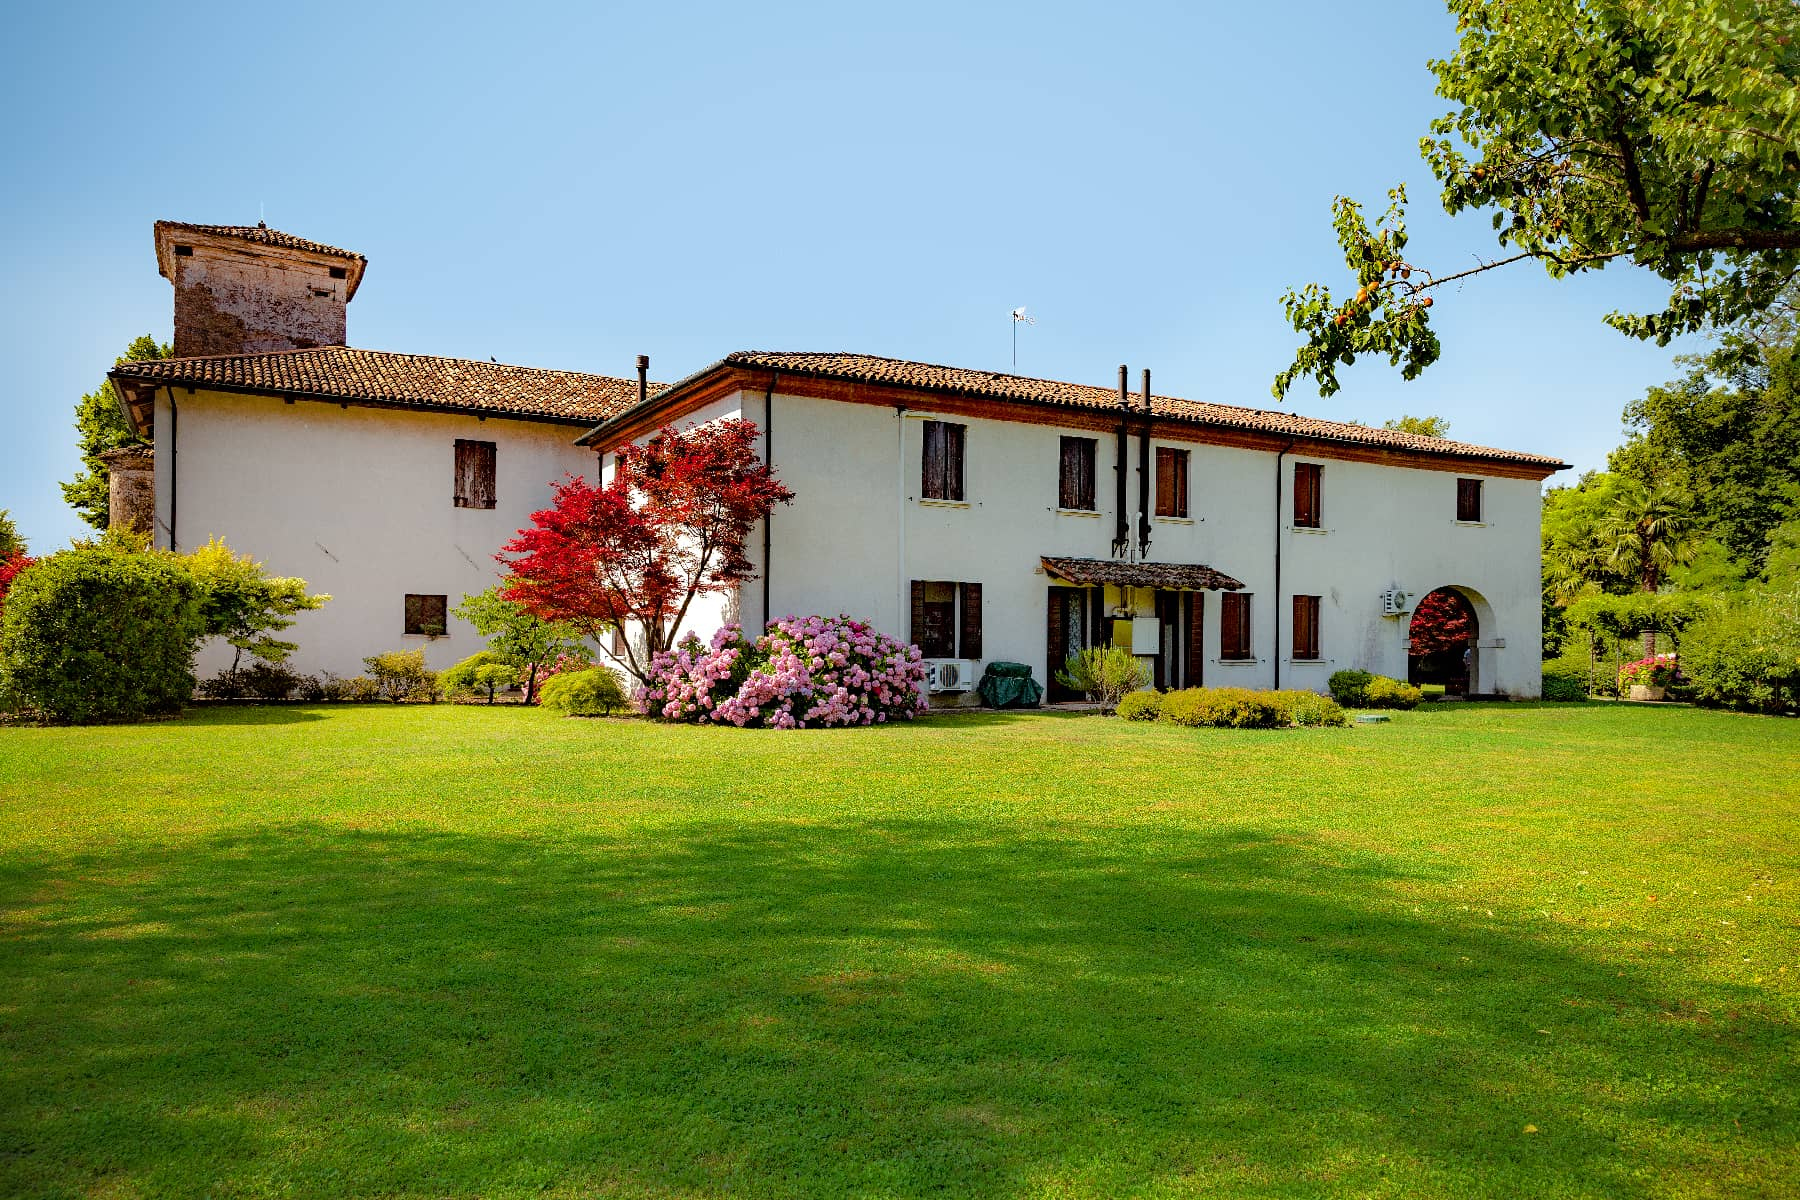 Villa in Vendita a Carbonera: 5 locali, 850 mq